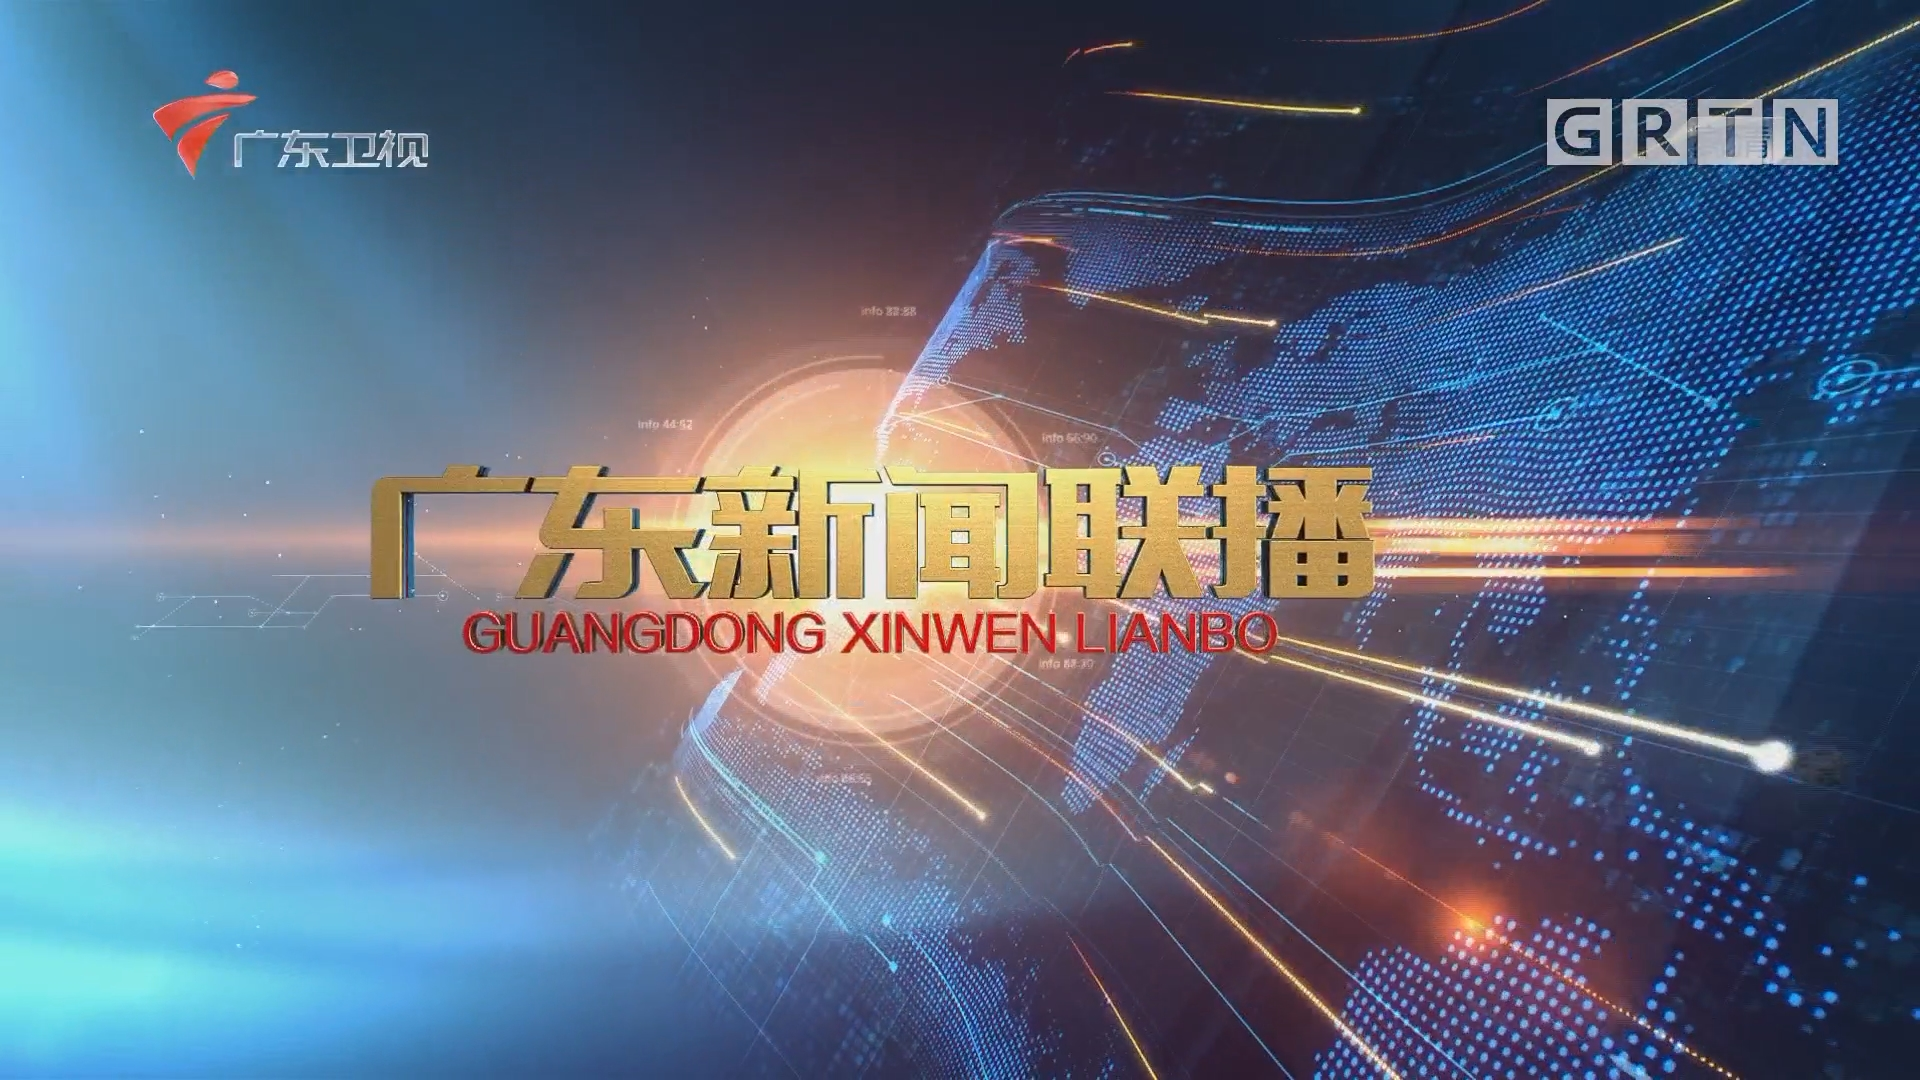 [HD][2018-03-09]广东新闻联播:十三届全国人大一次会议举行第二次全体会议